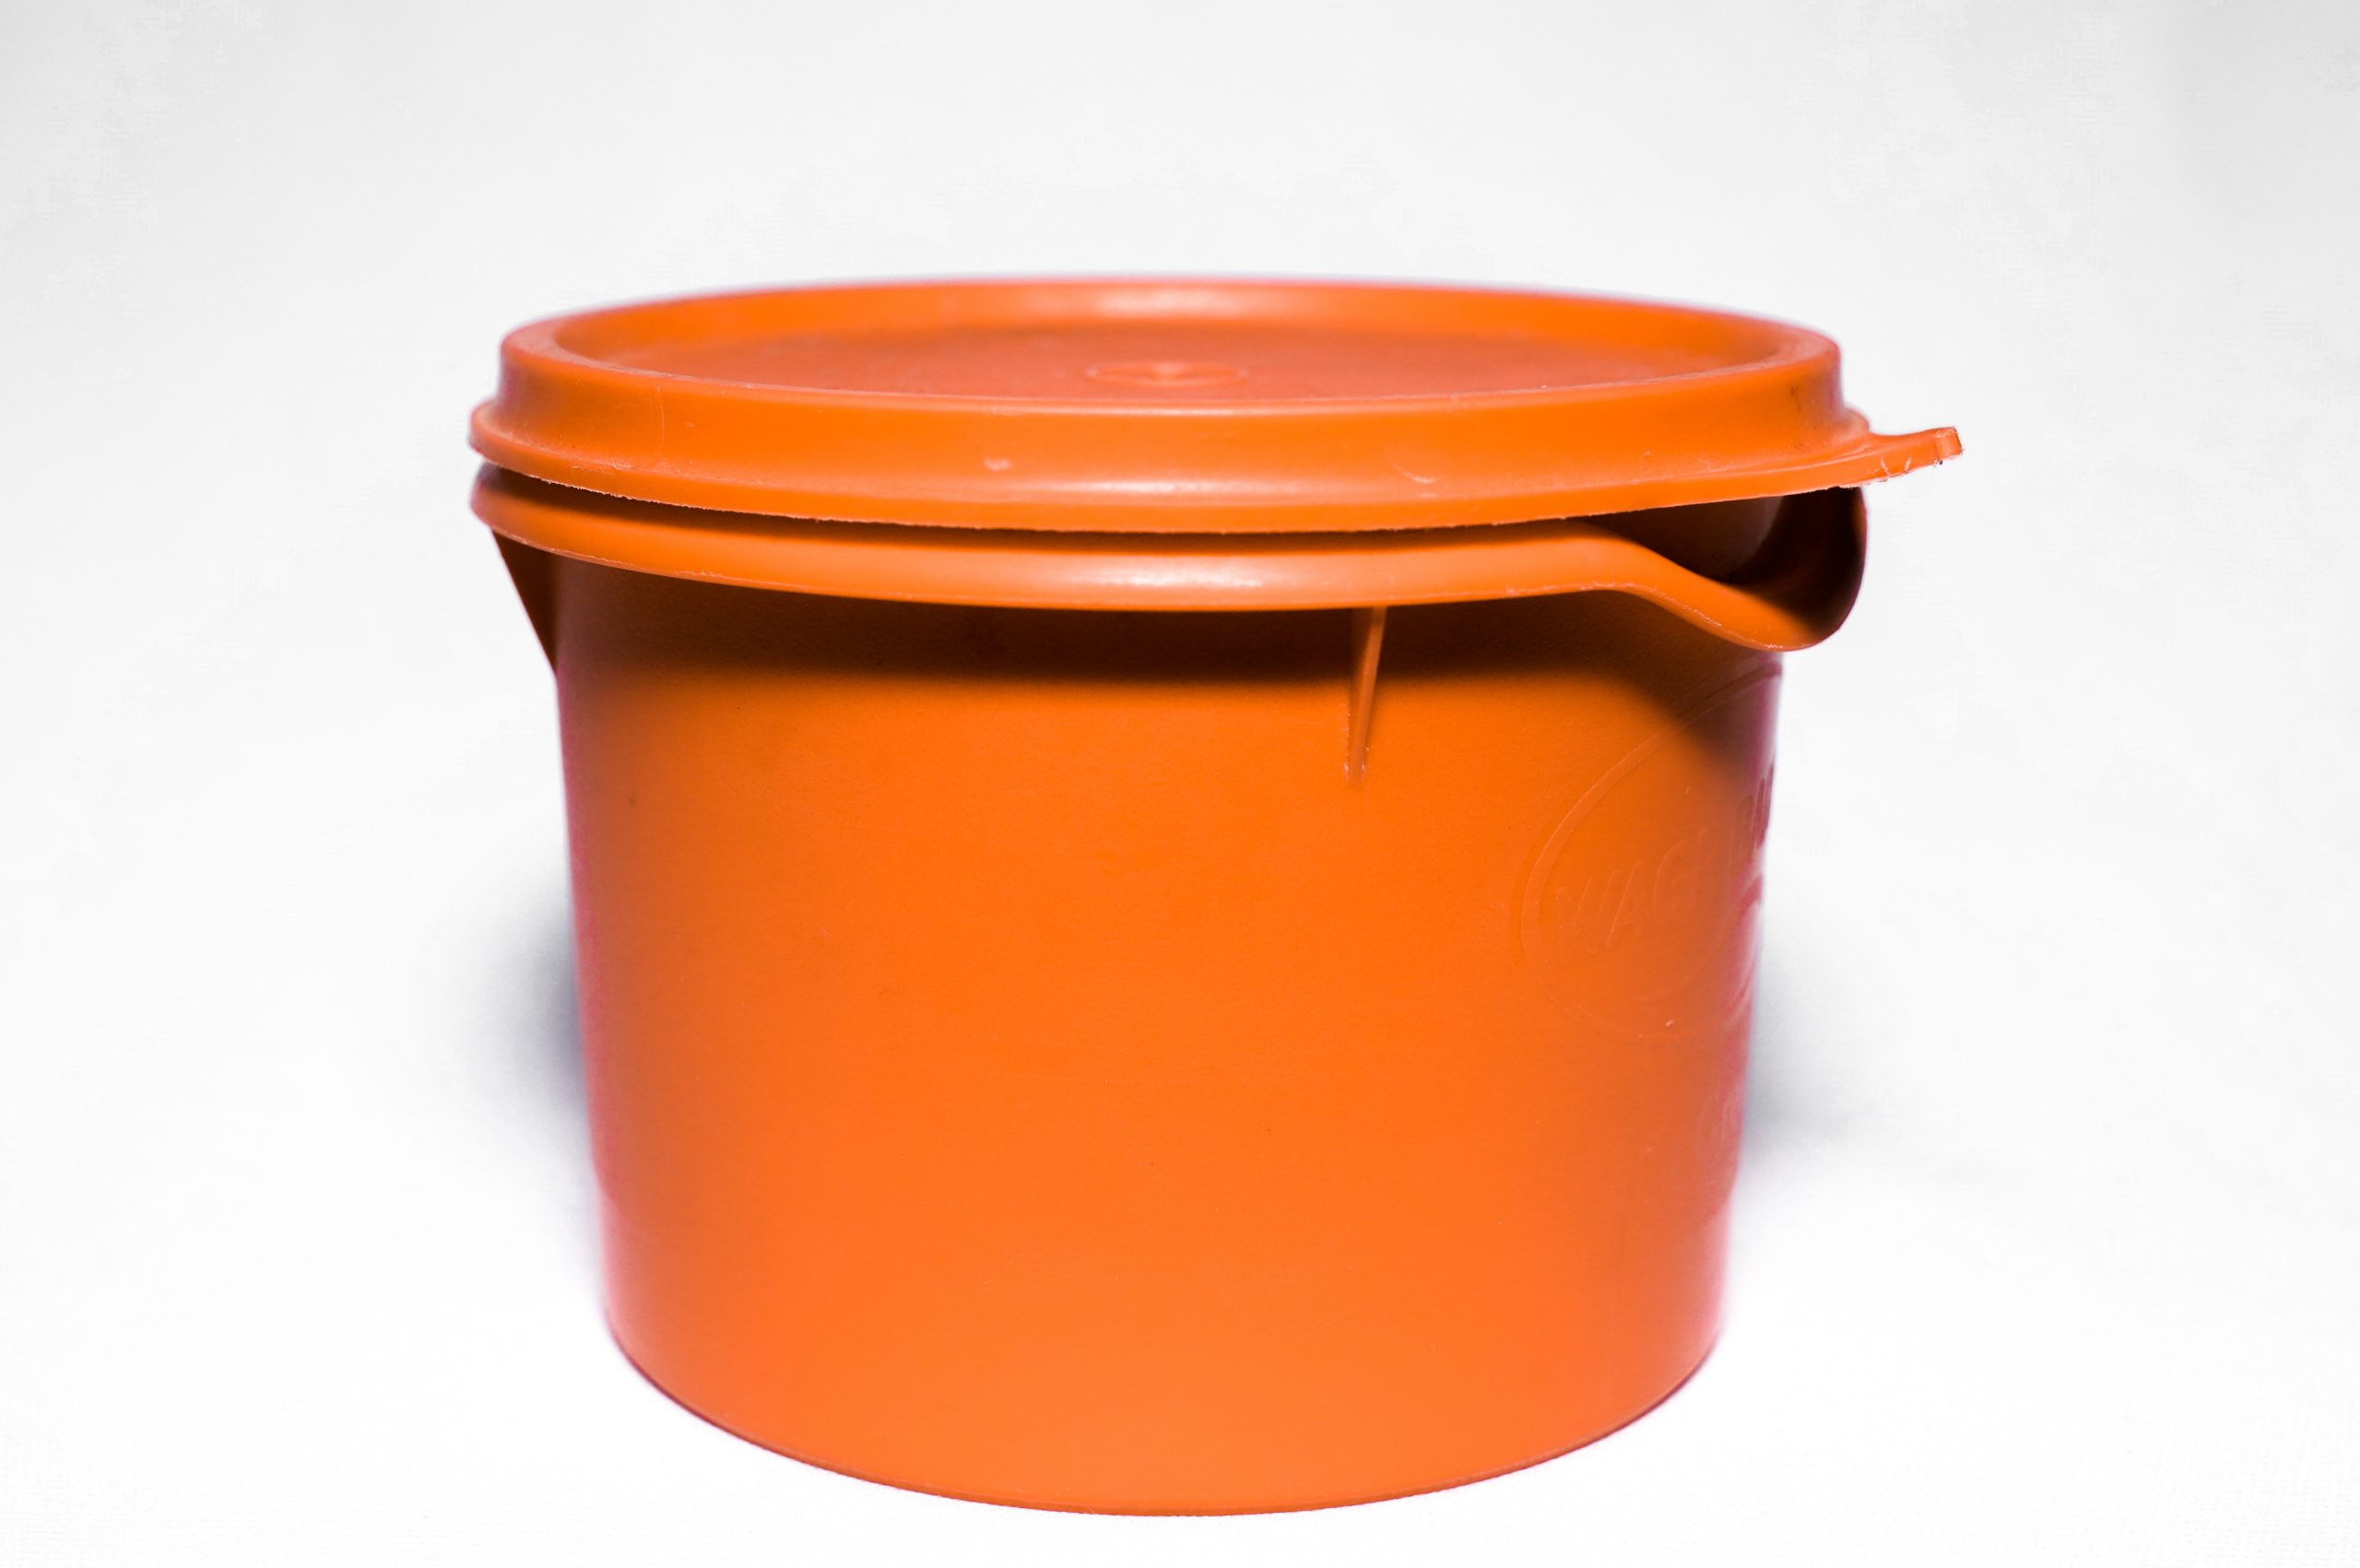 Orange Tiffin Box in white background